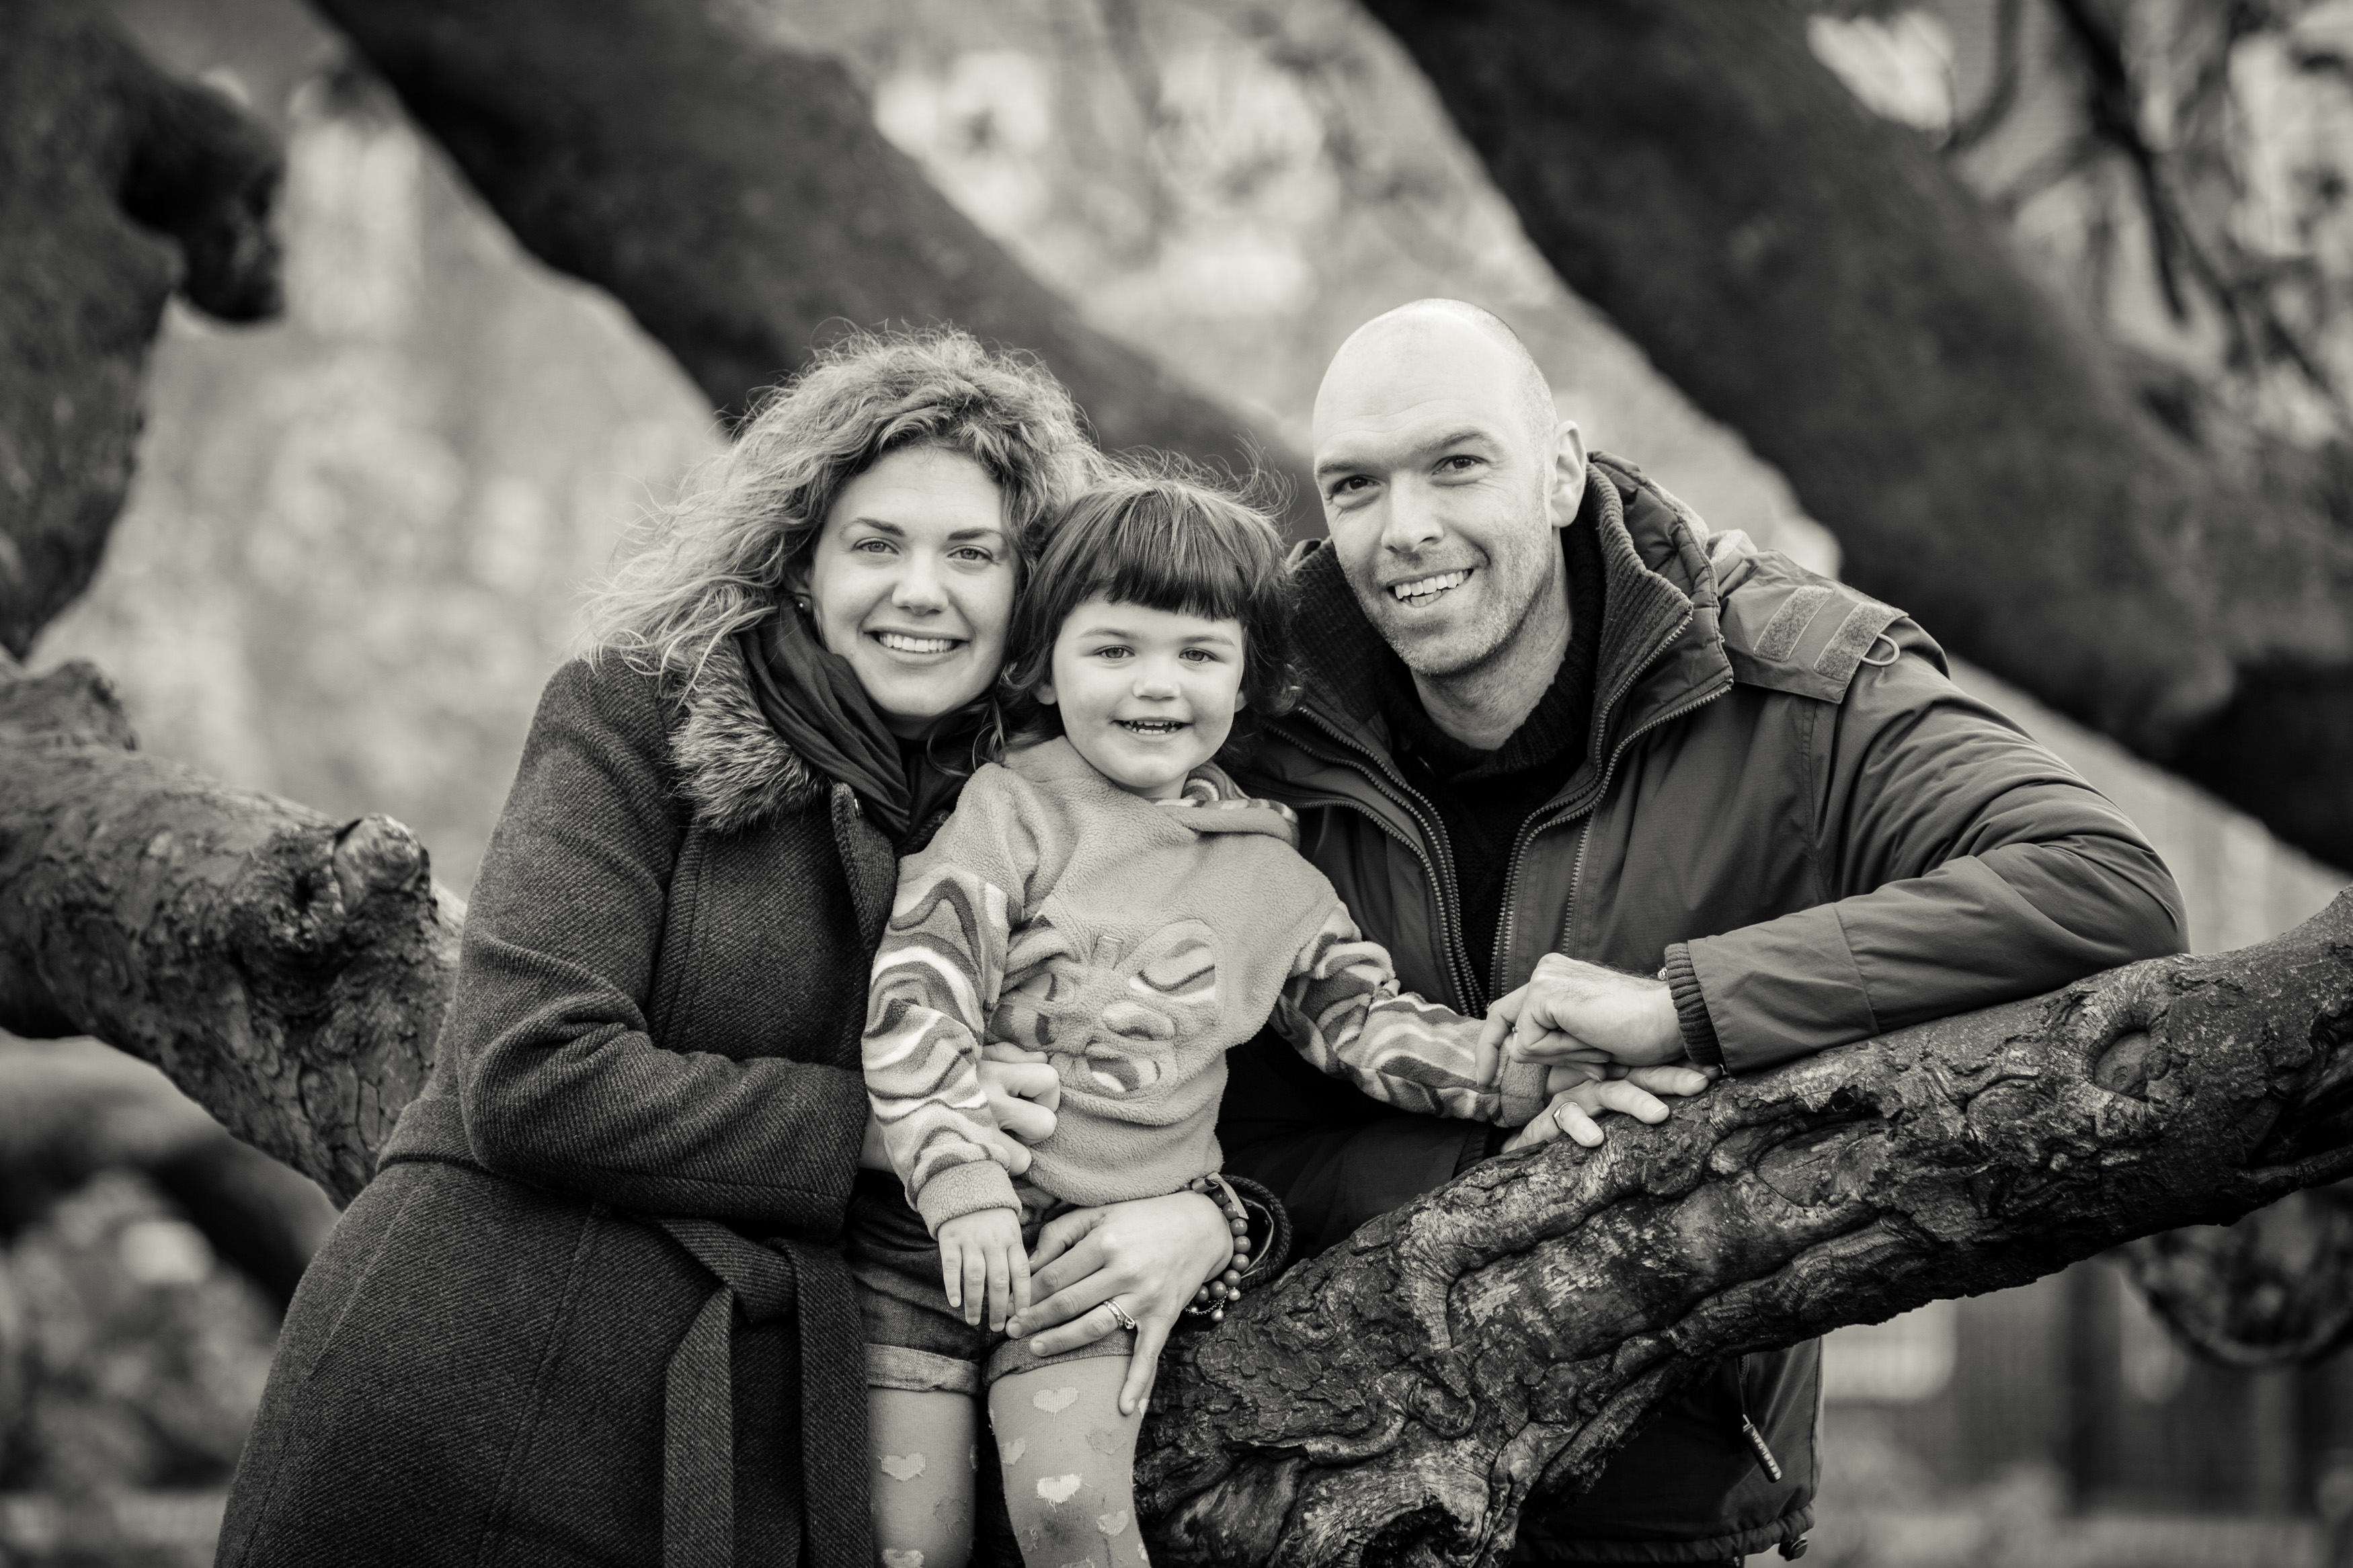 Family photo shoot, Clissold Park